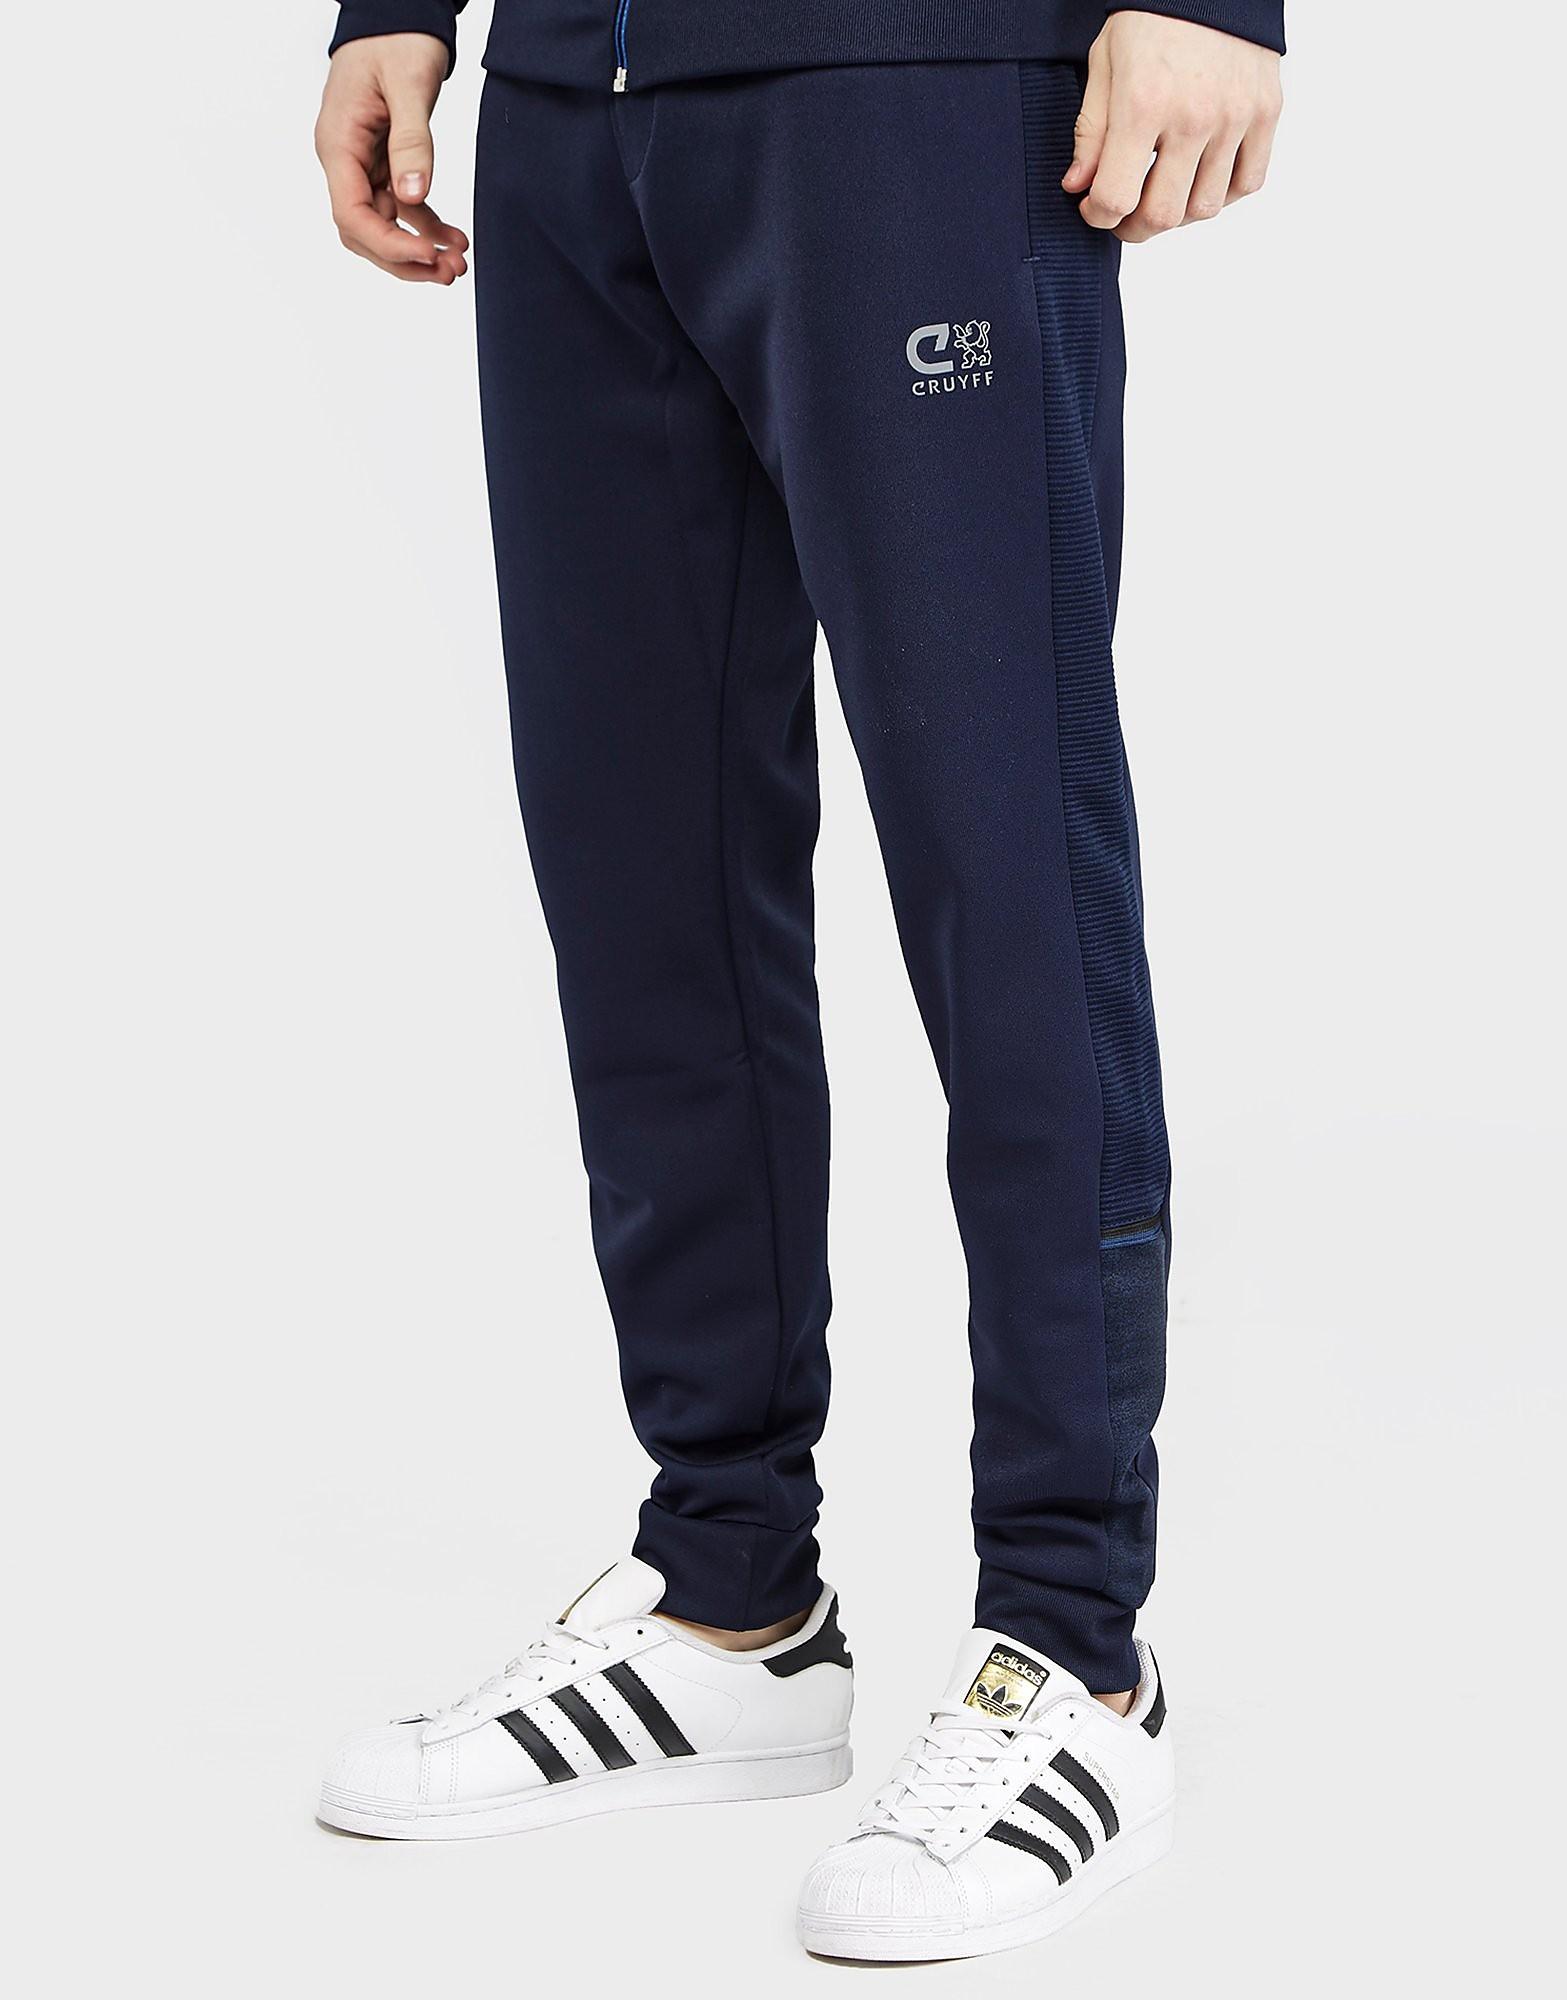 Cruyff Lawson Ply CF Track Pants